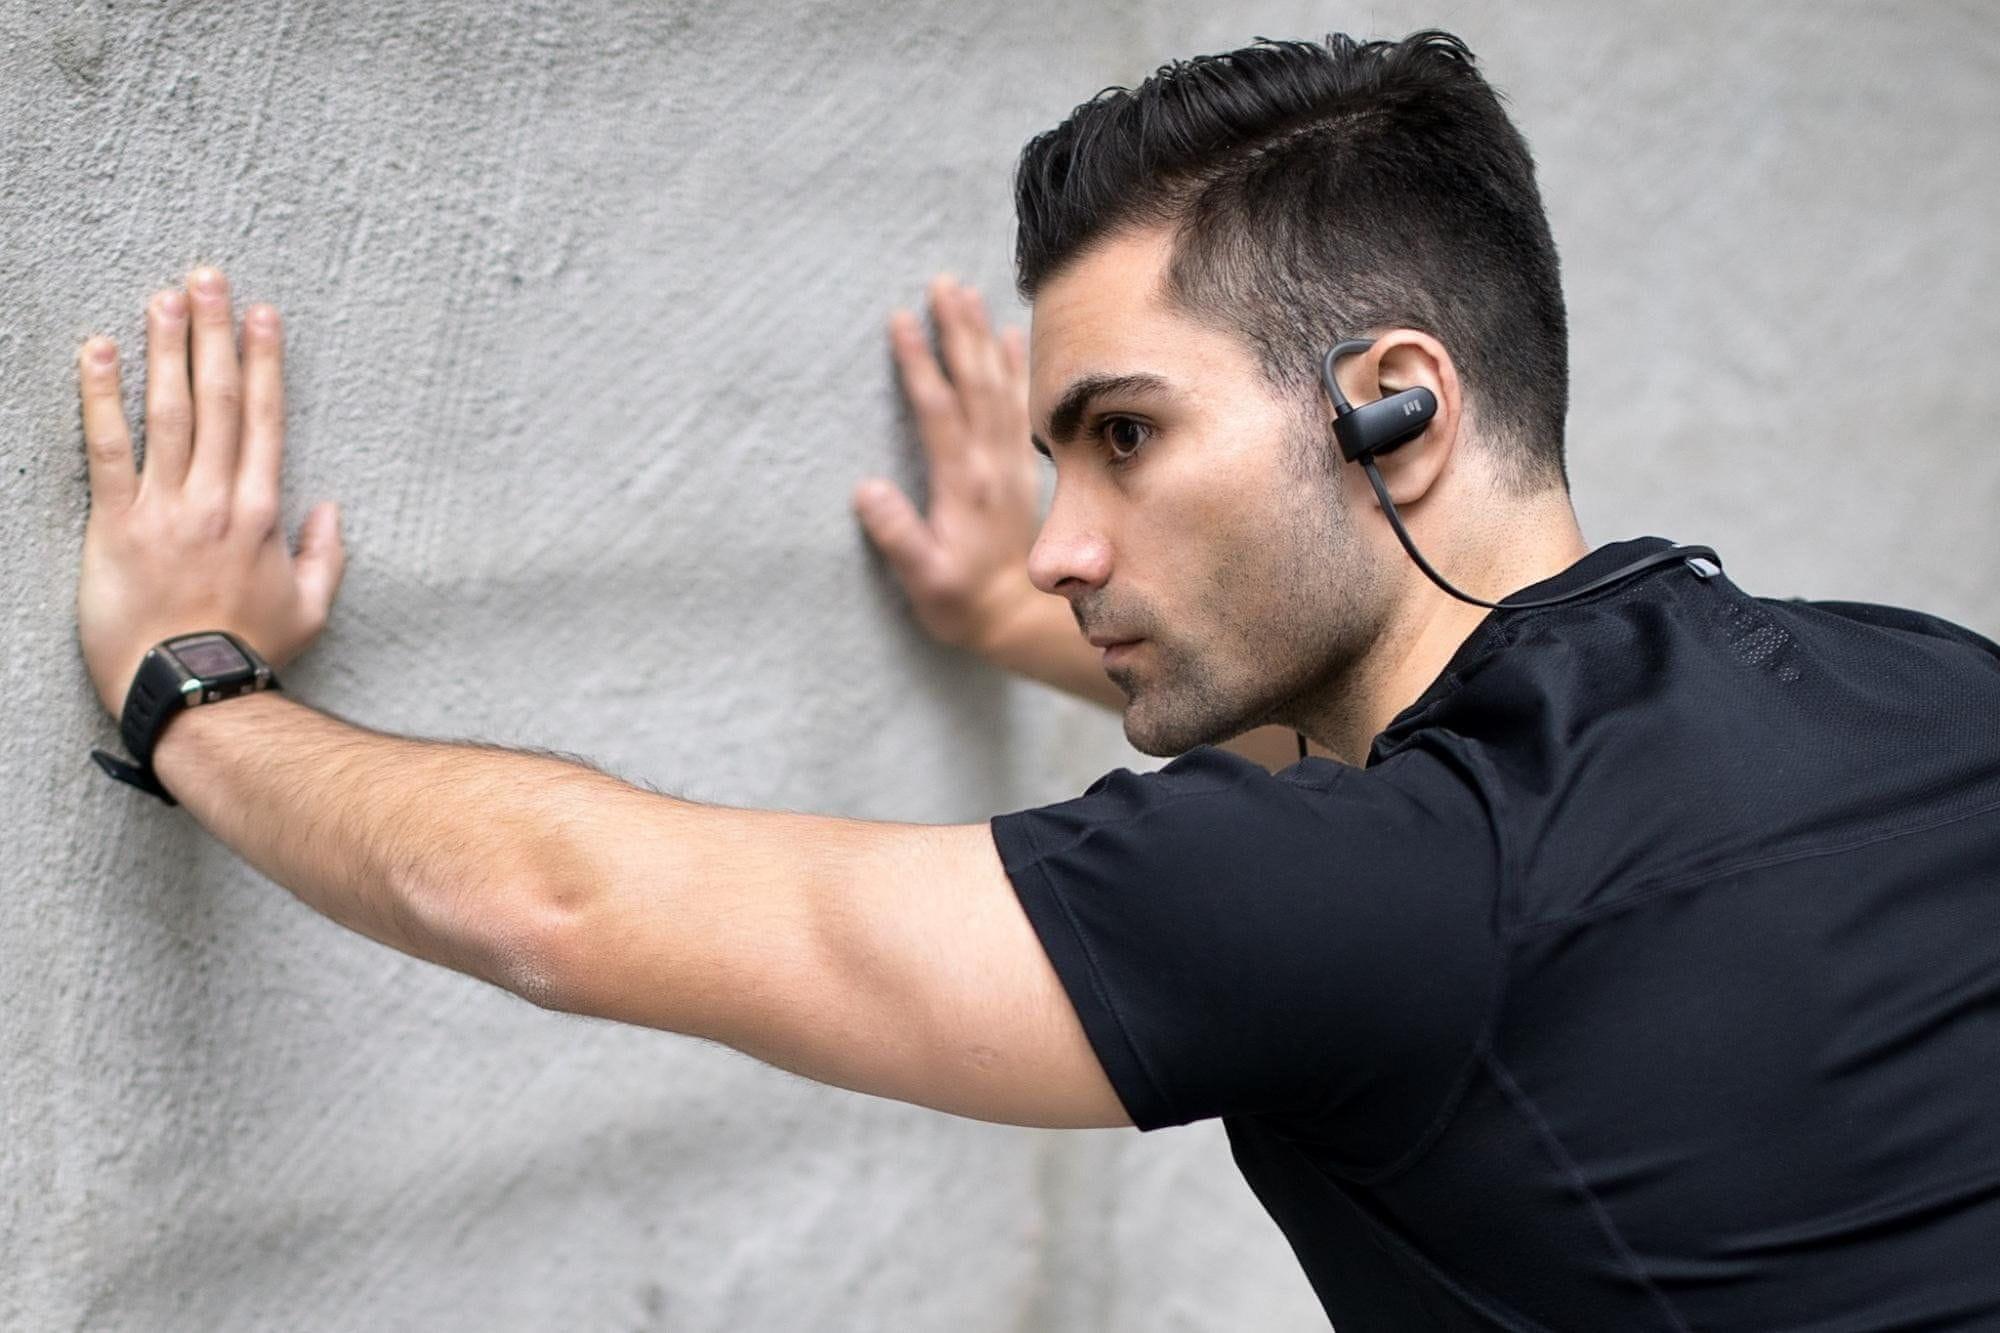 Bezdrátová sluchátka Miiego M1 skladné voděodolné pouzdro